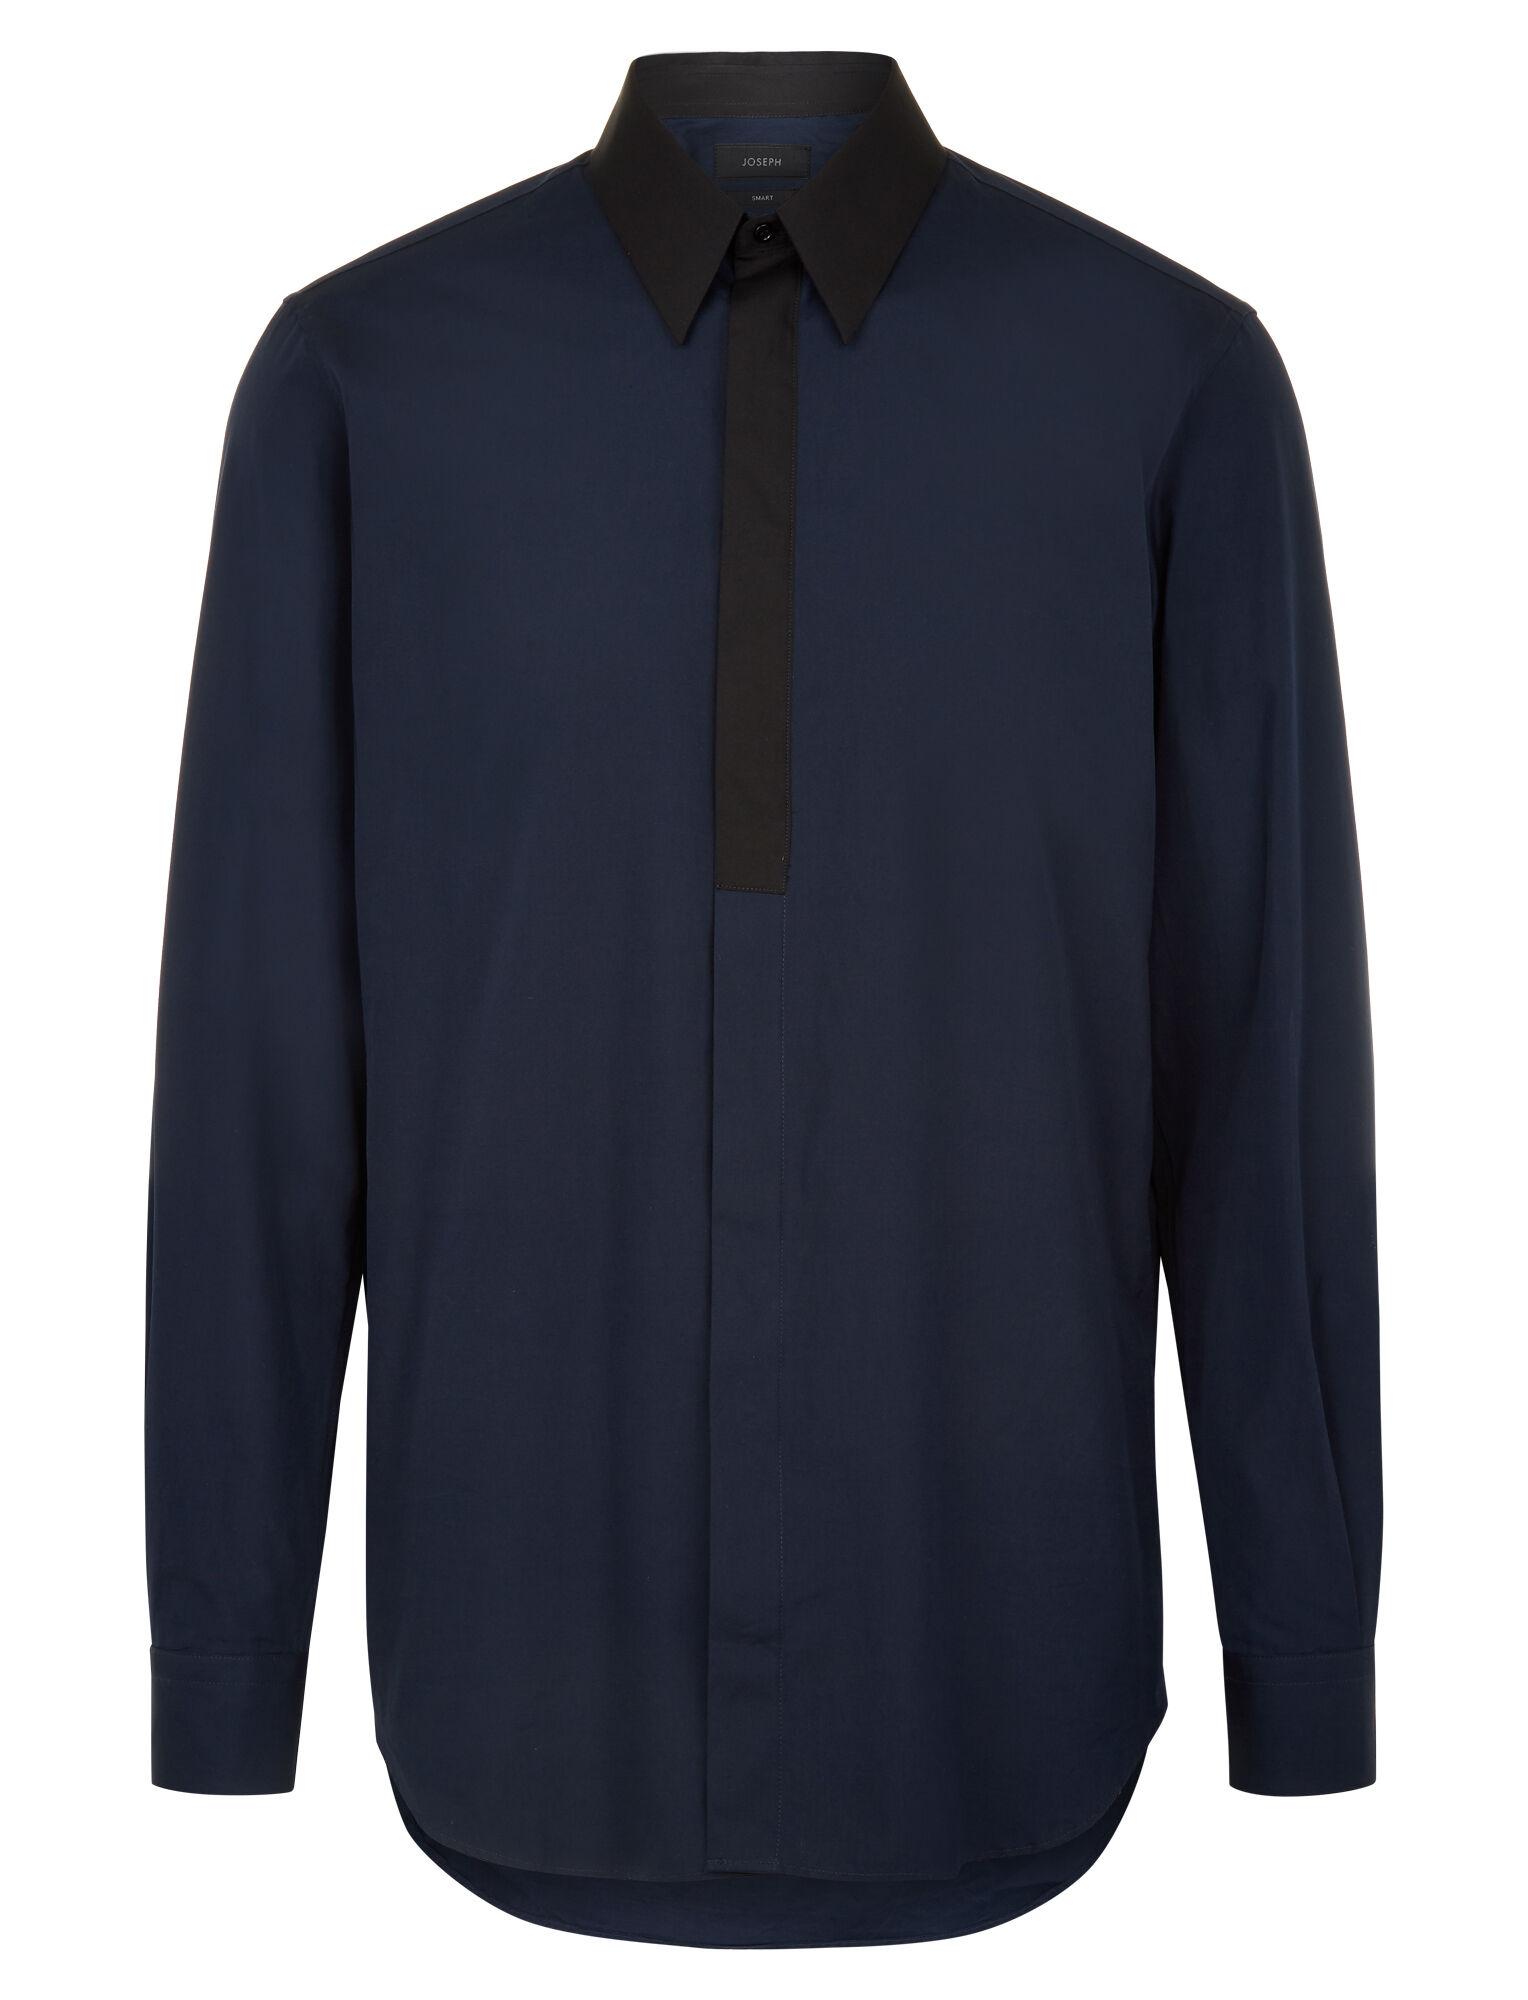 Joseph, Montecarlo Poplin + Ppln Stretch Shirt, in NAVY COMBO